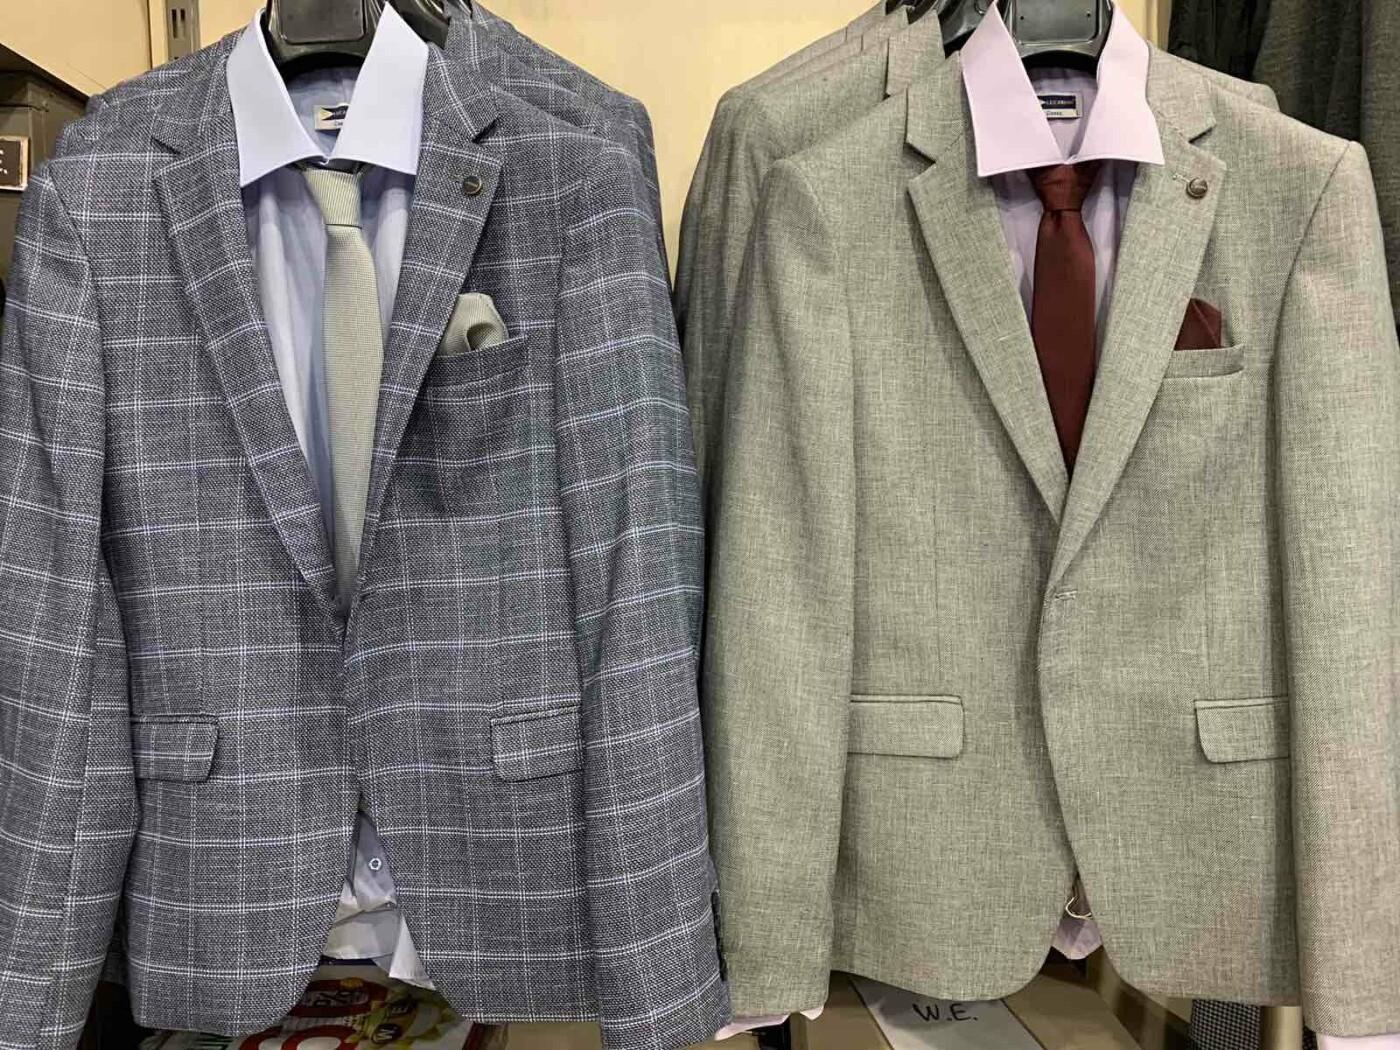 Свадьба в карантин: мариупольцам предлагают прокат мужских костюмов , фото-3